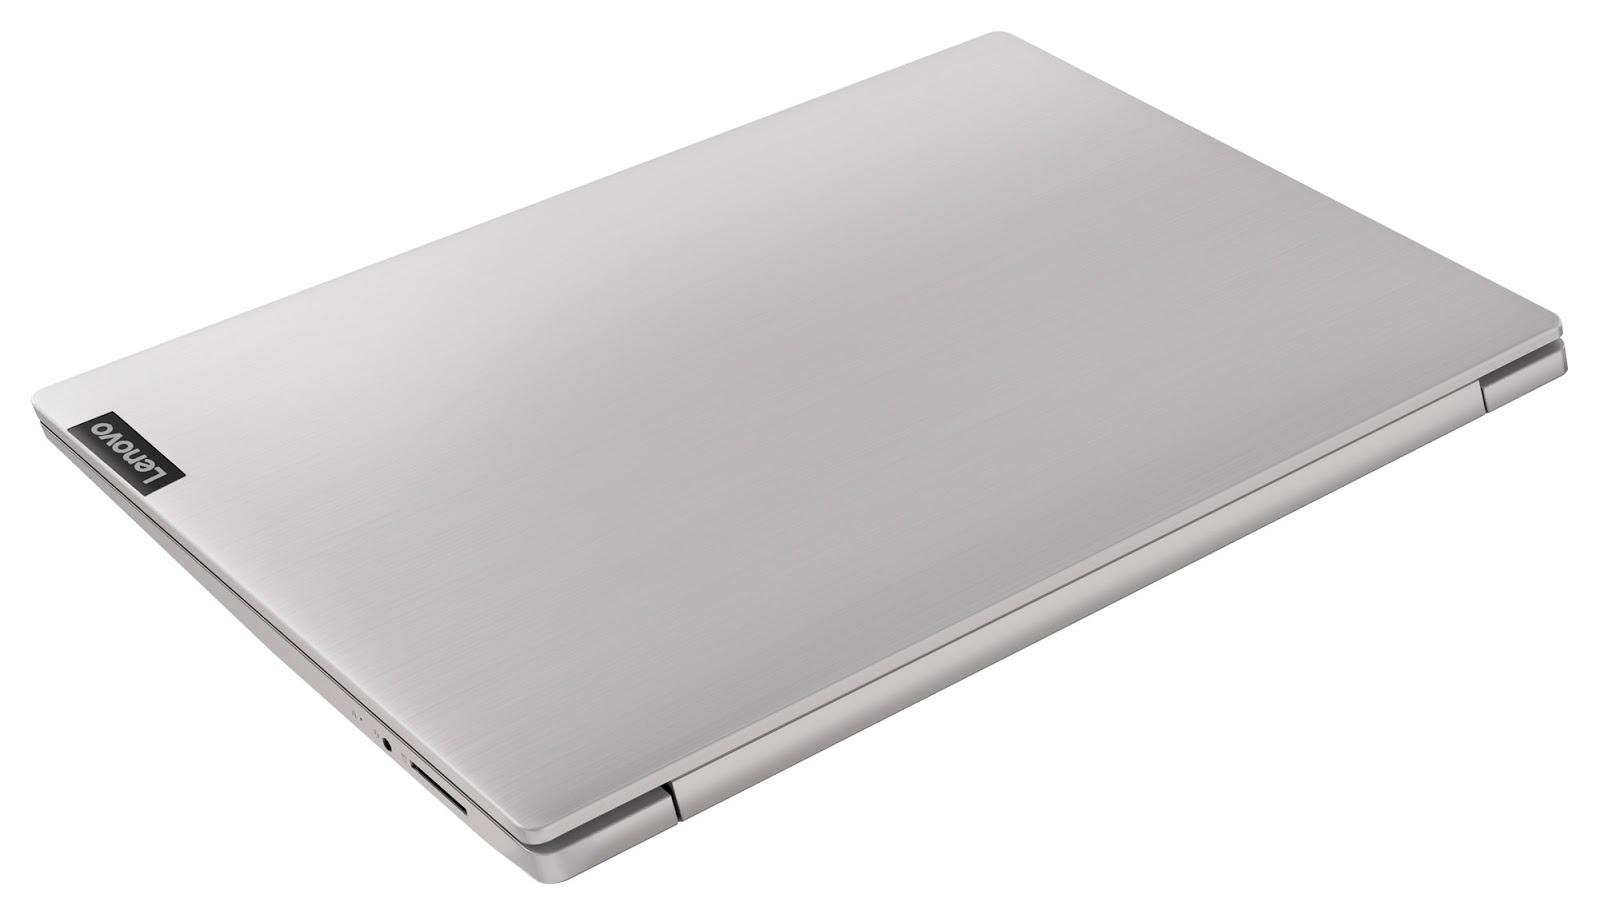 Фото 1. Ноутбук Lenovo ideapad S145-15IGM Grey (81MX003QRE)